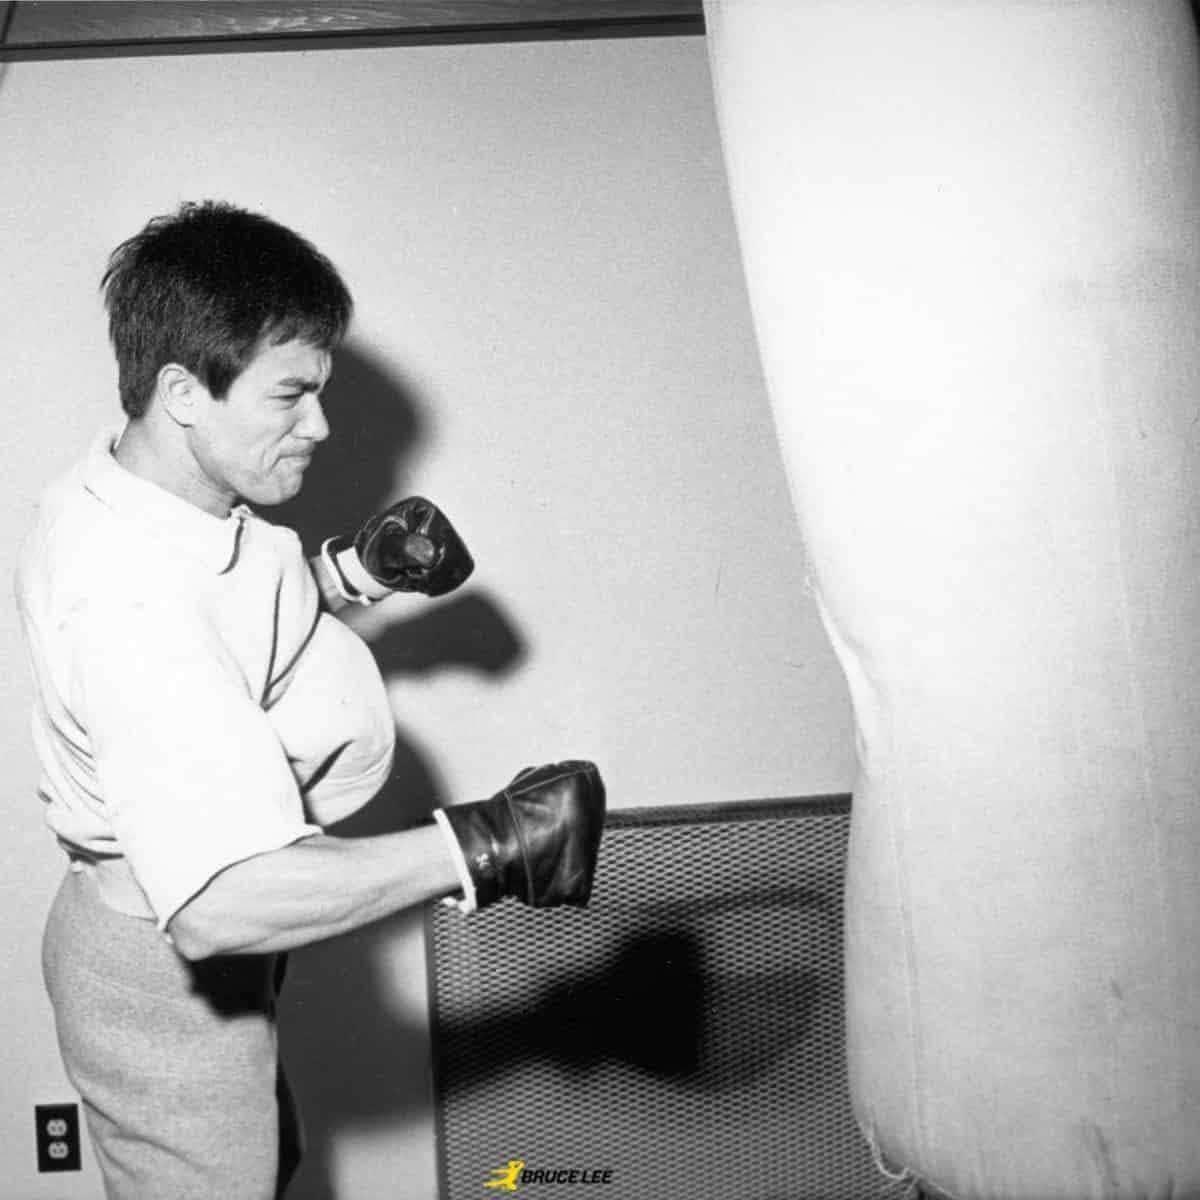 Bruce Lee Flying Man Training Gloves